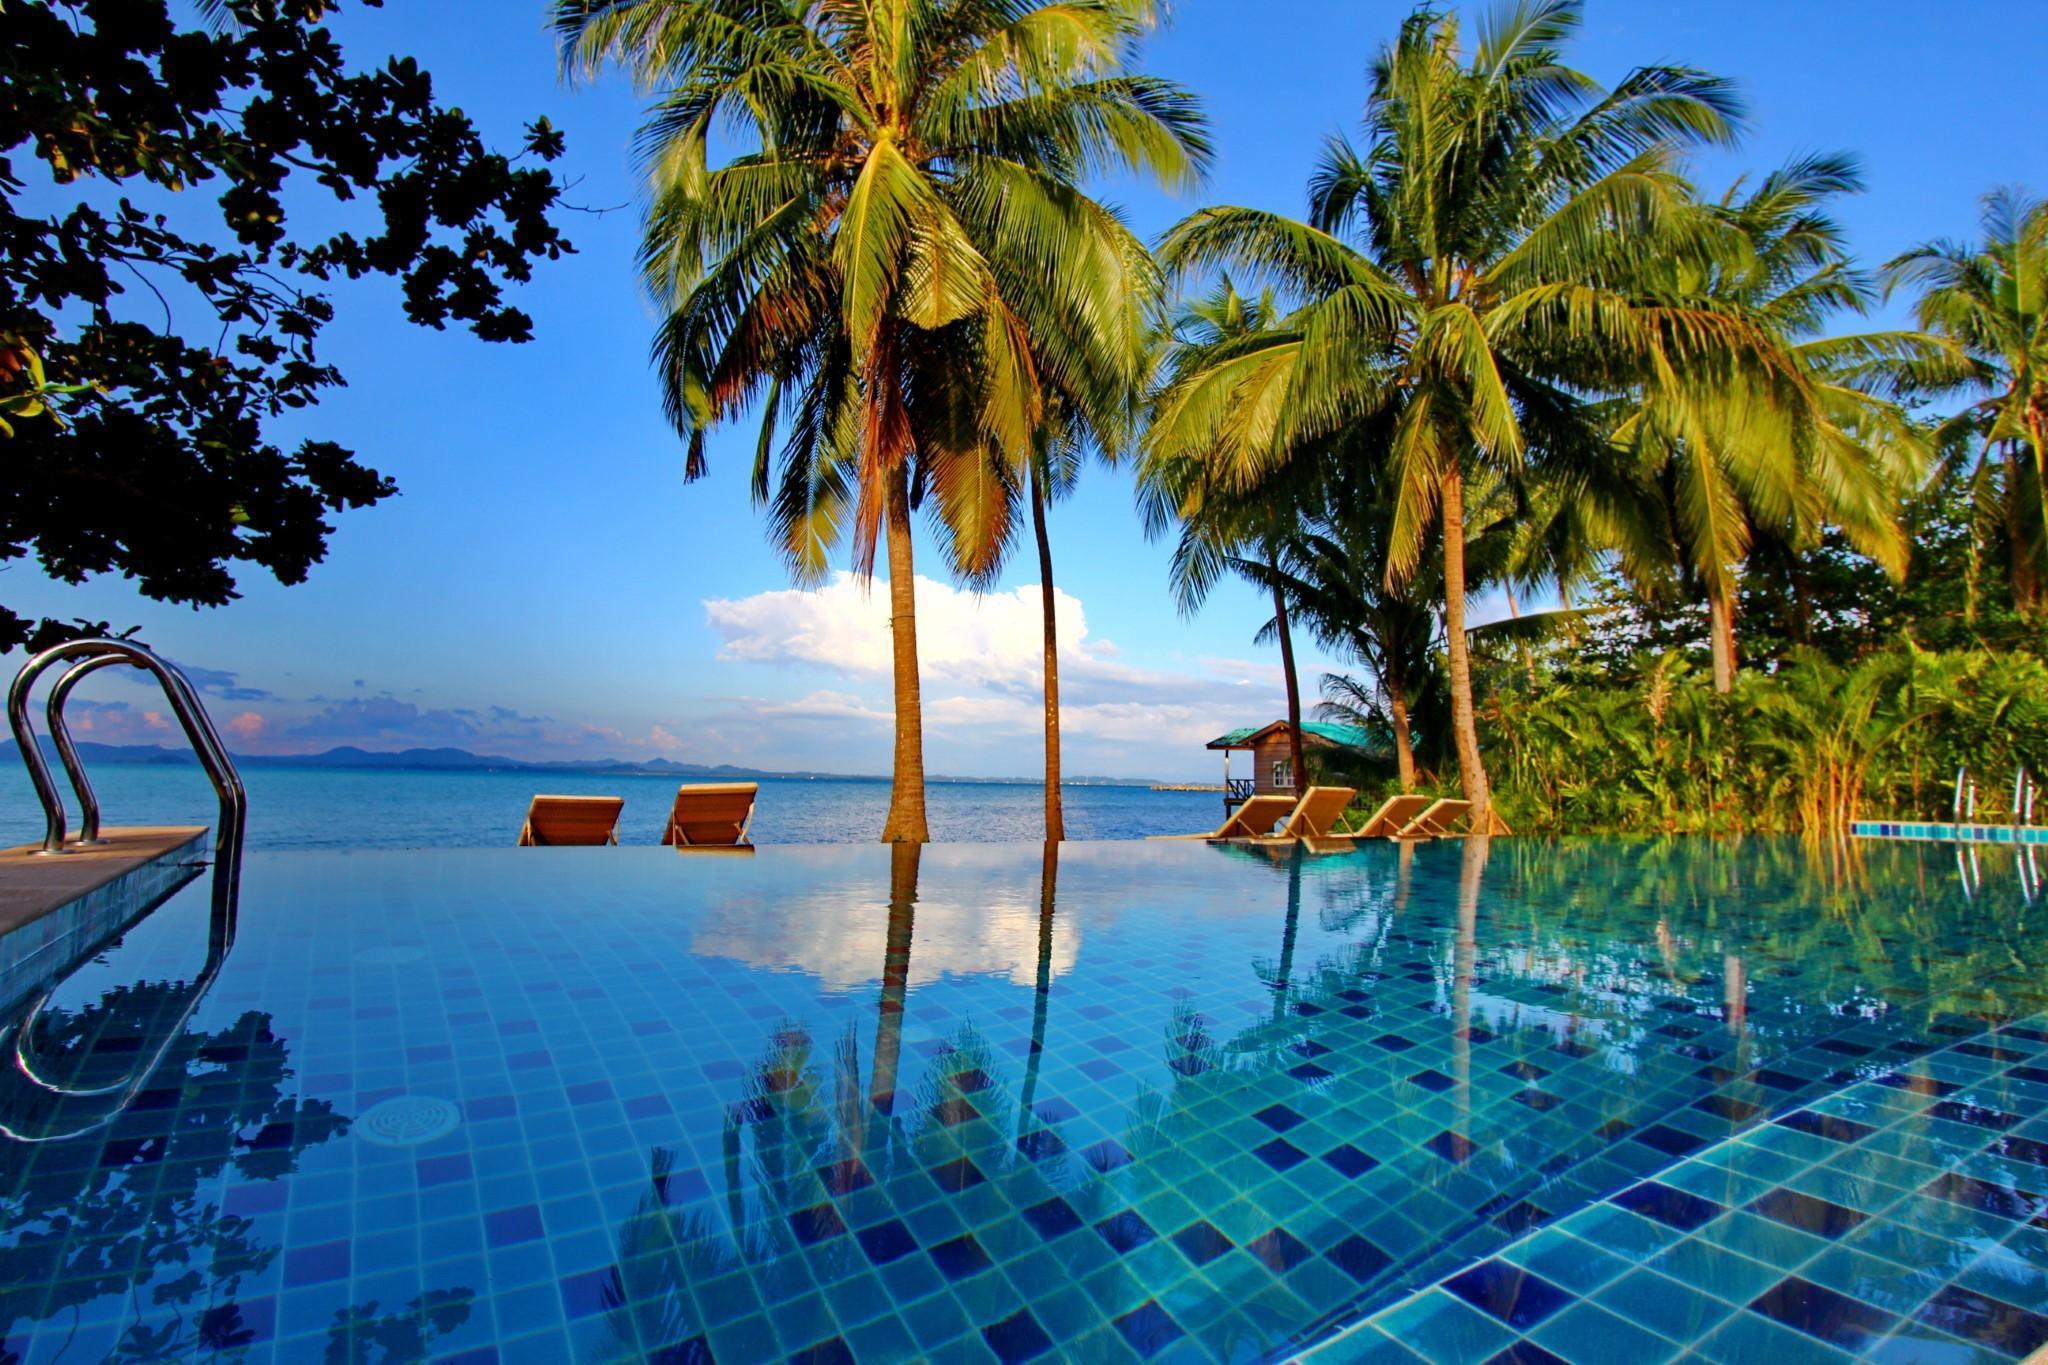 Serenity Resort Koh Chang เซเรนนิตี้ รีสอร์ท เกาะช้าง